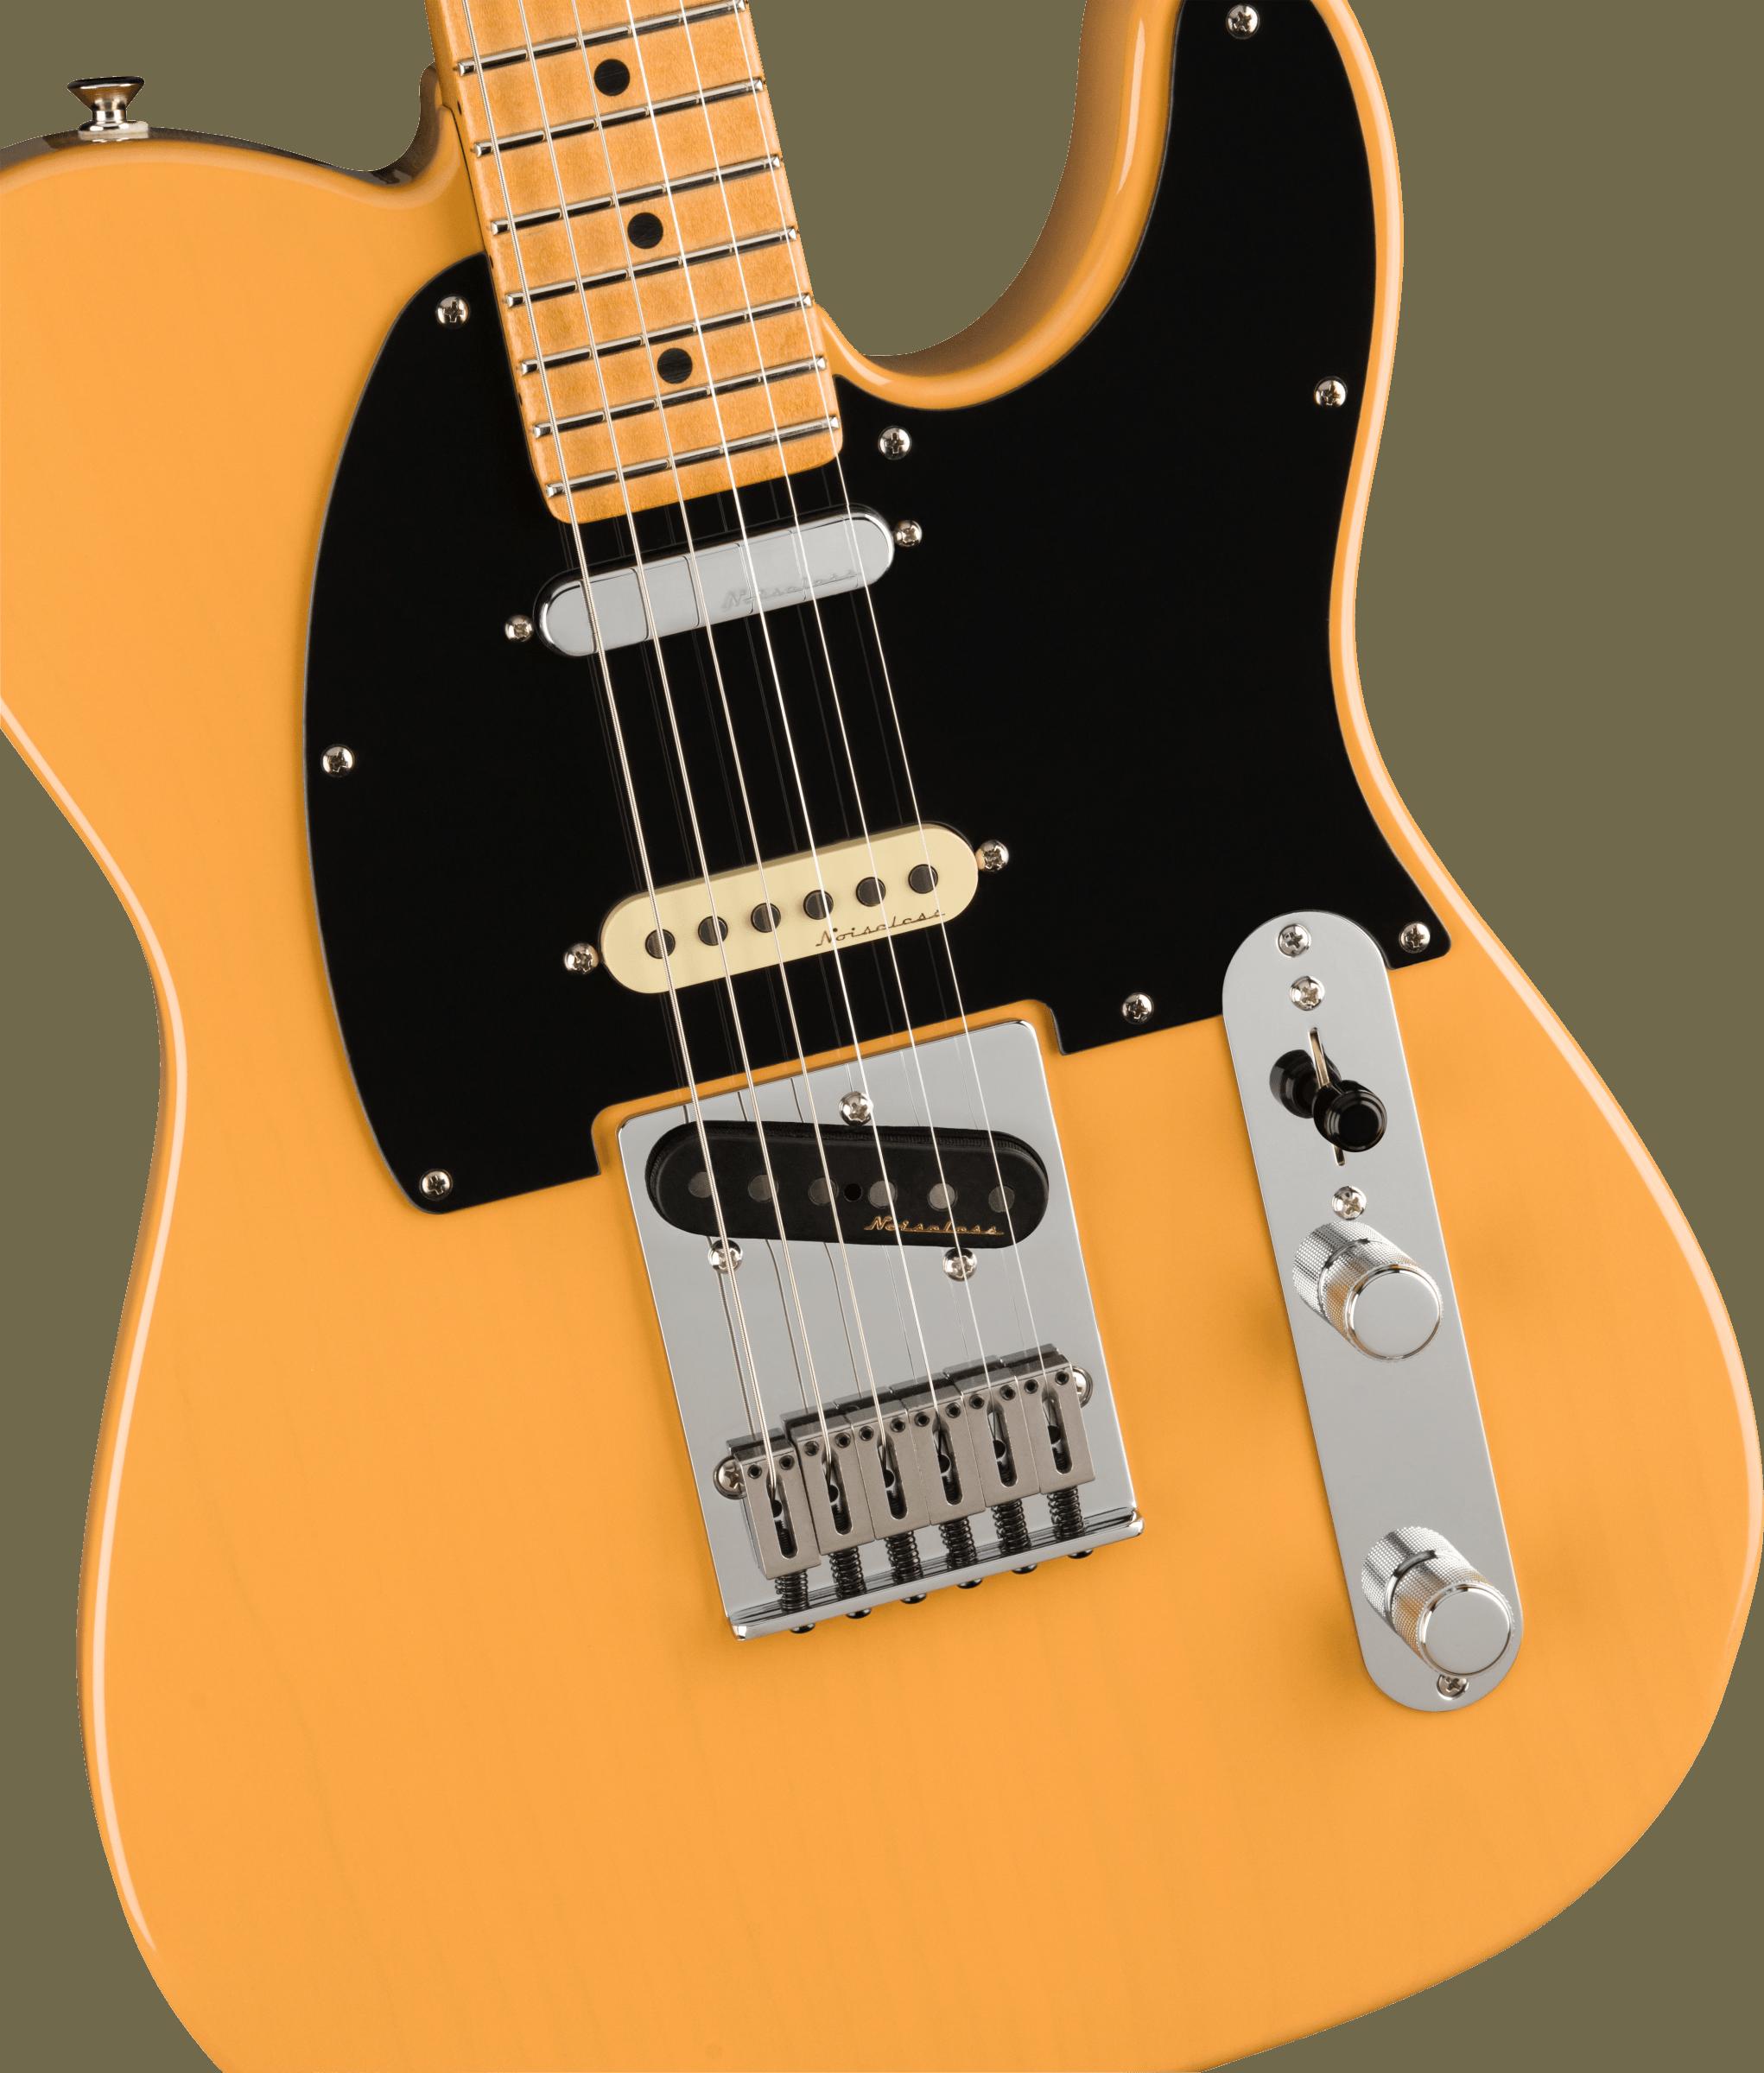 Fender Player Plus Nashville Telecaster -Butterscotch Blonde